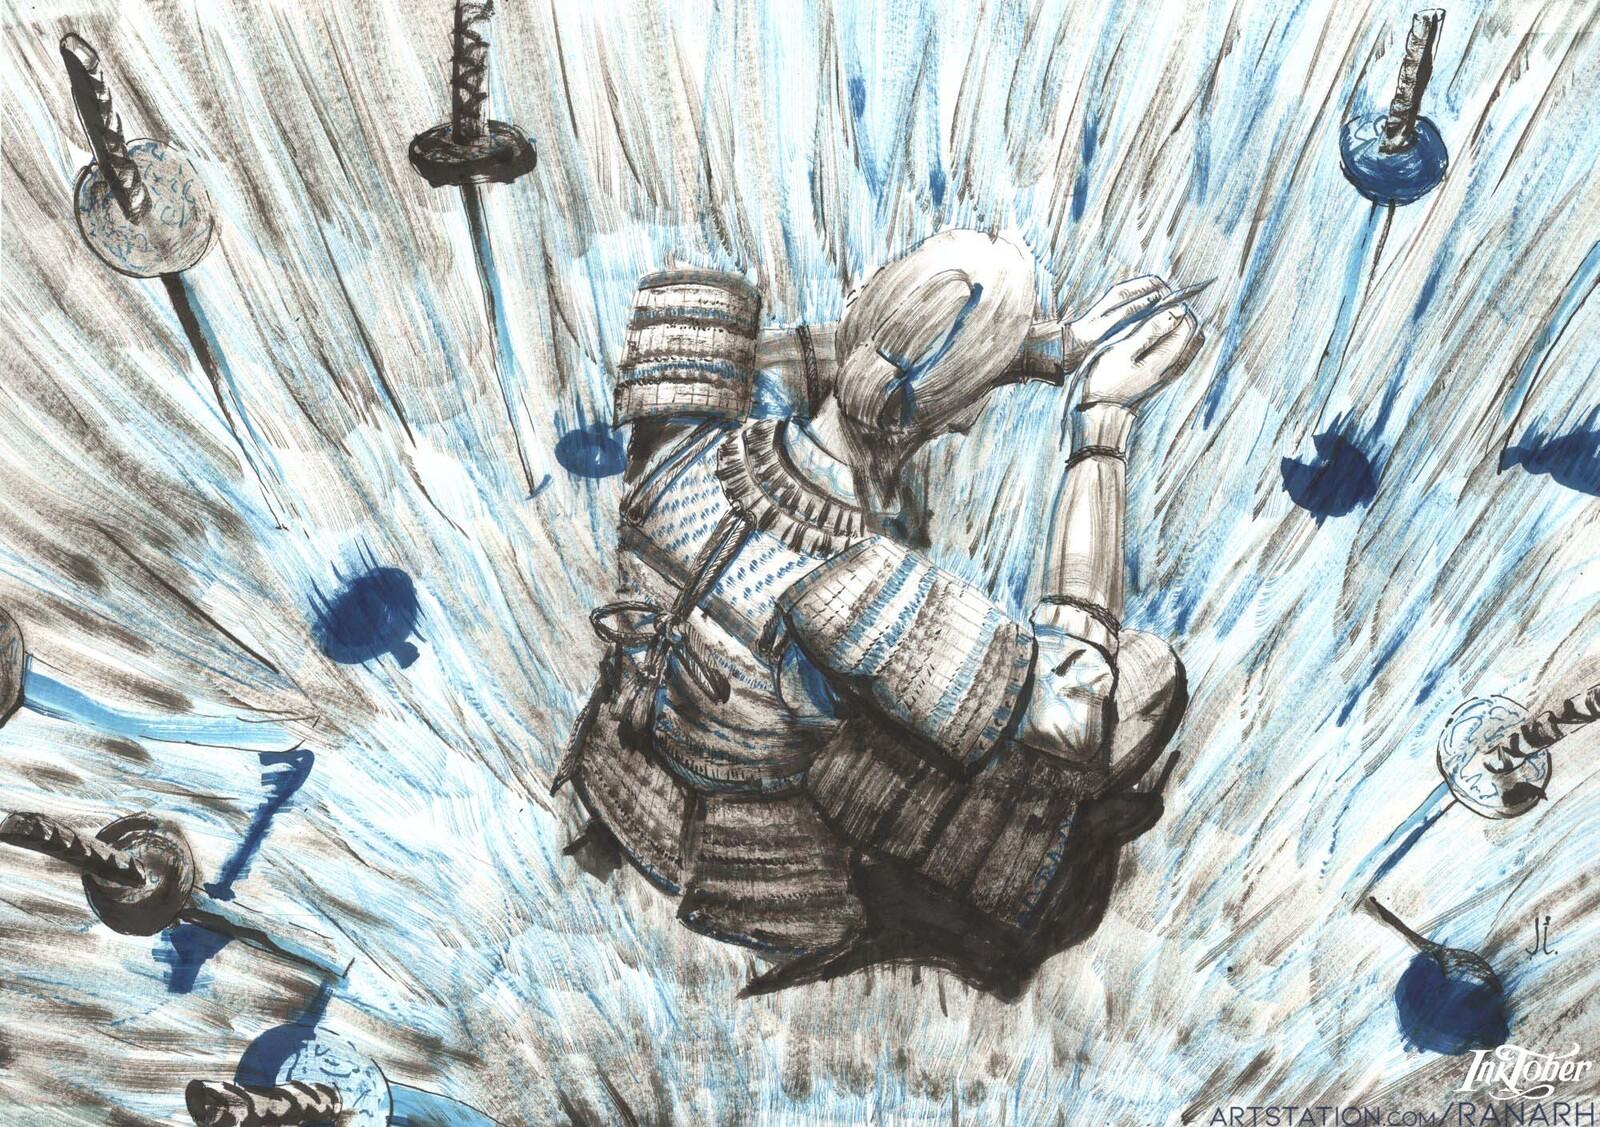 5. Blade Blademastery Blows